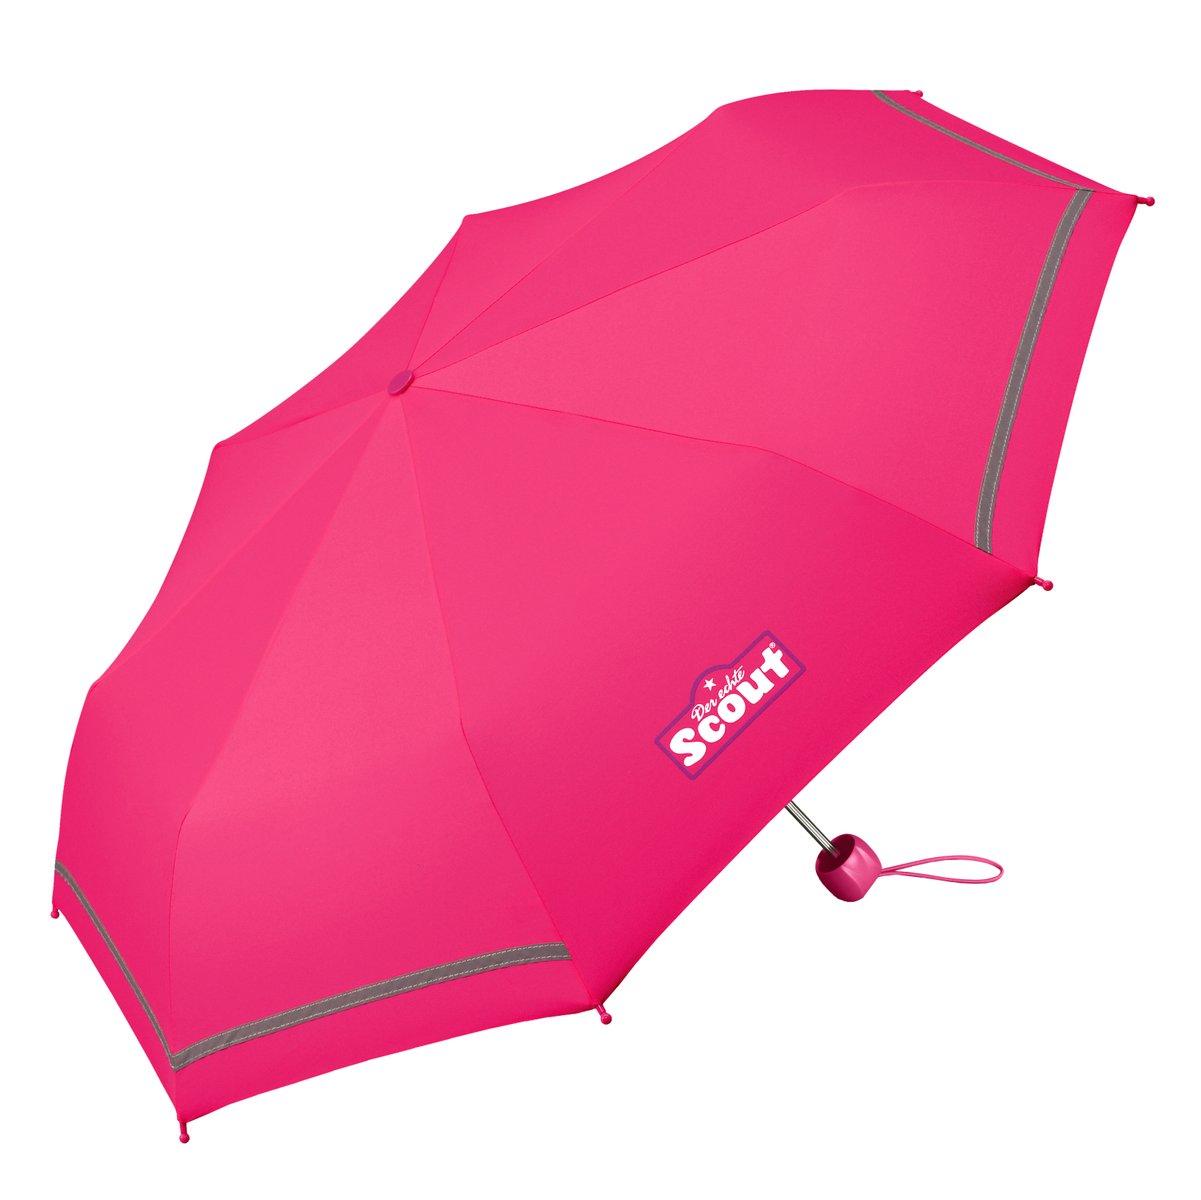 Scout Regenschirm Taschenschirm  Pink